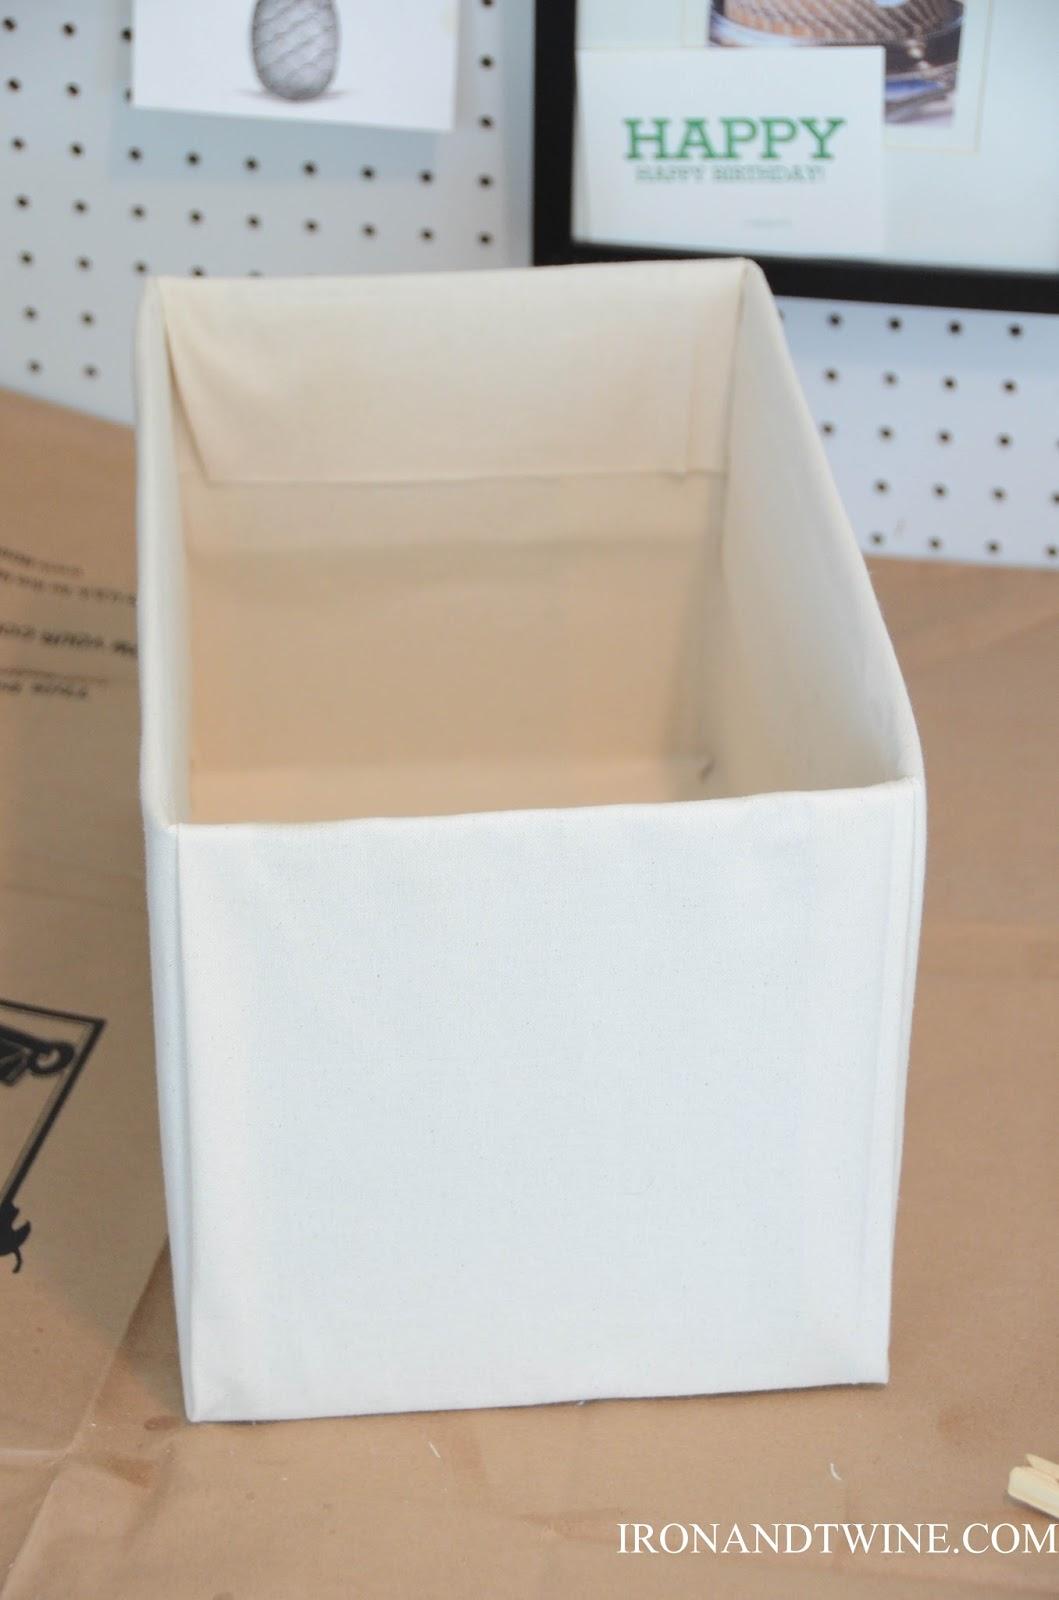 DIY+Belt+Handled+Box,+DIY+fabric+covered+box,+Iron+and+Twine+(30).jpg